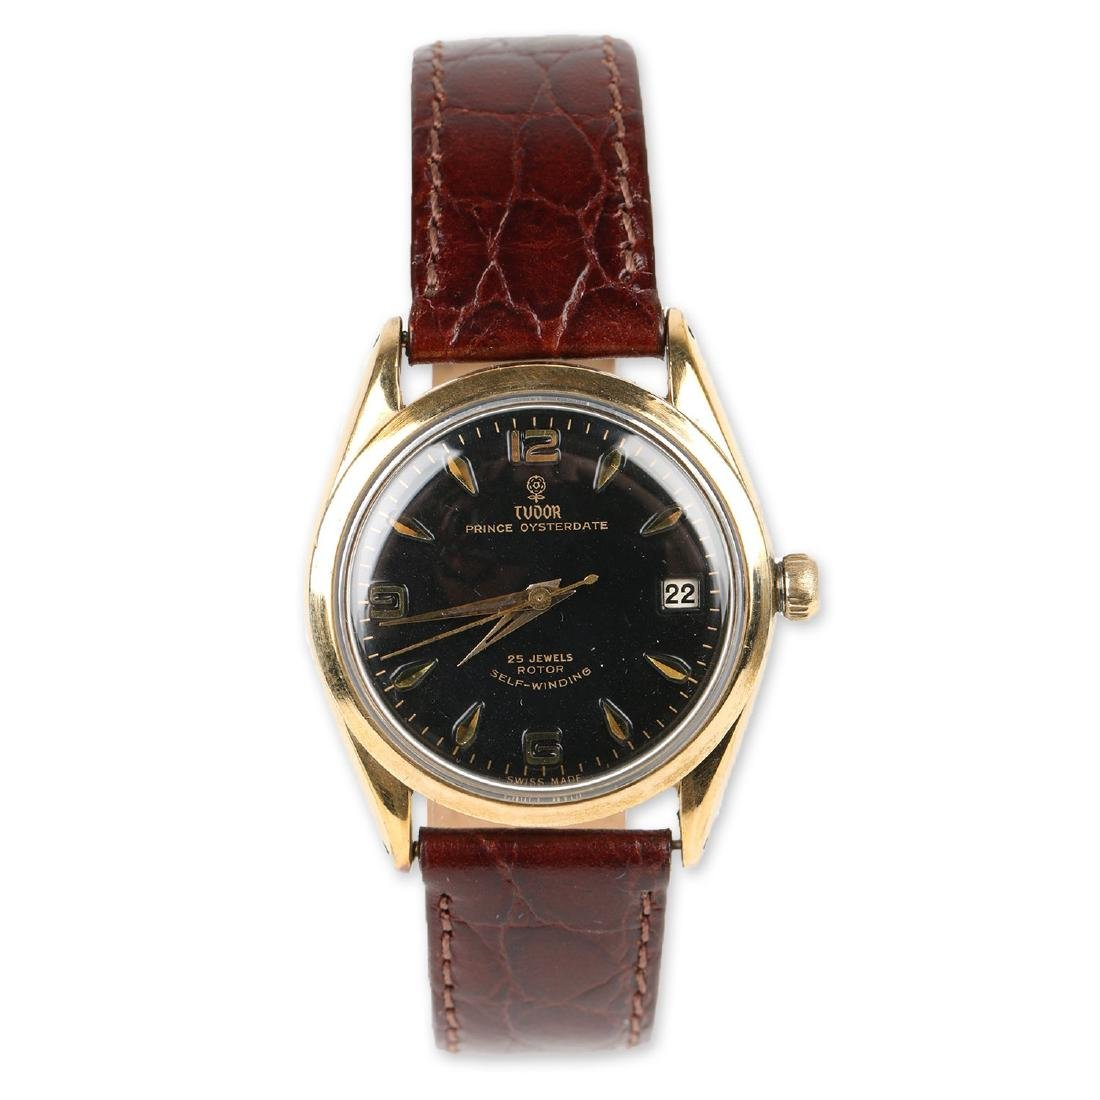 Rolex Tudor Prince Oysterdate Wristwatch